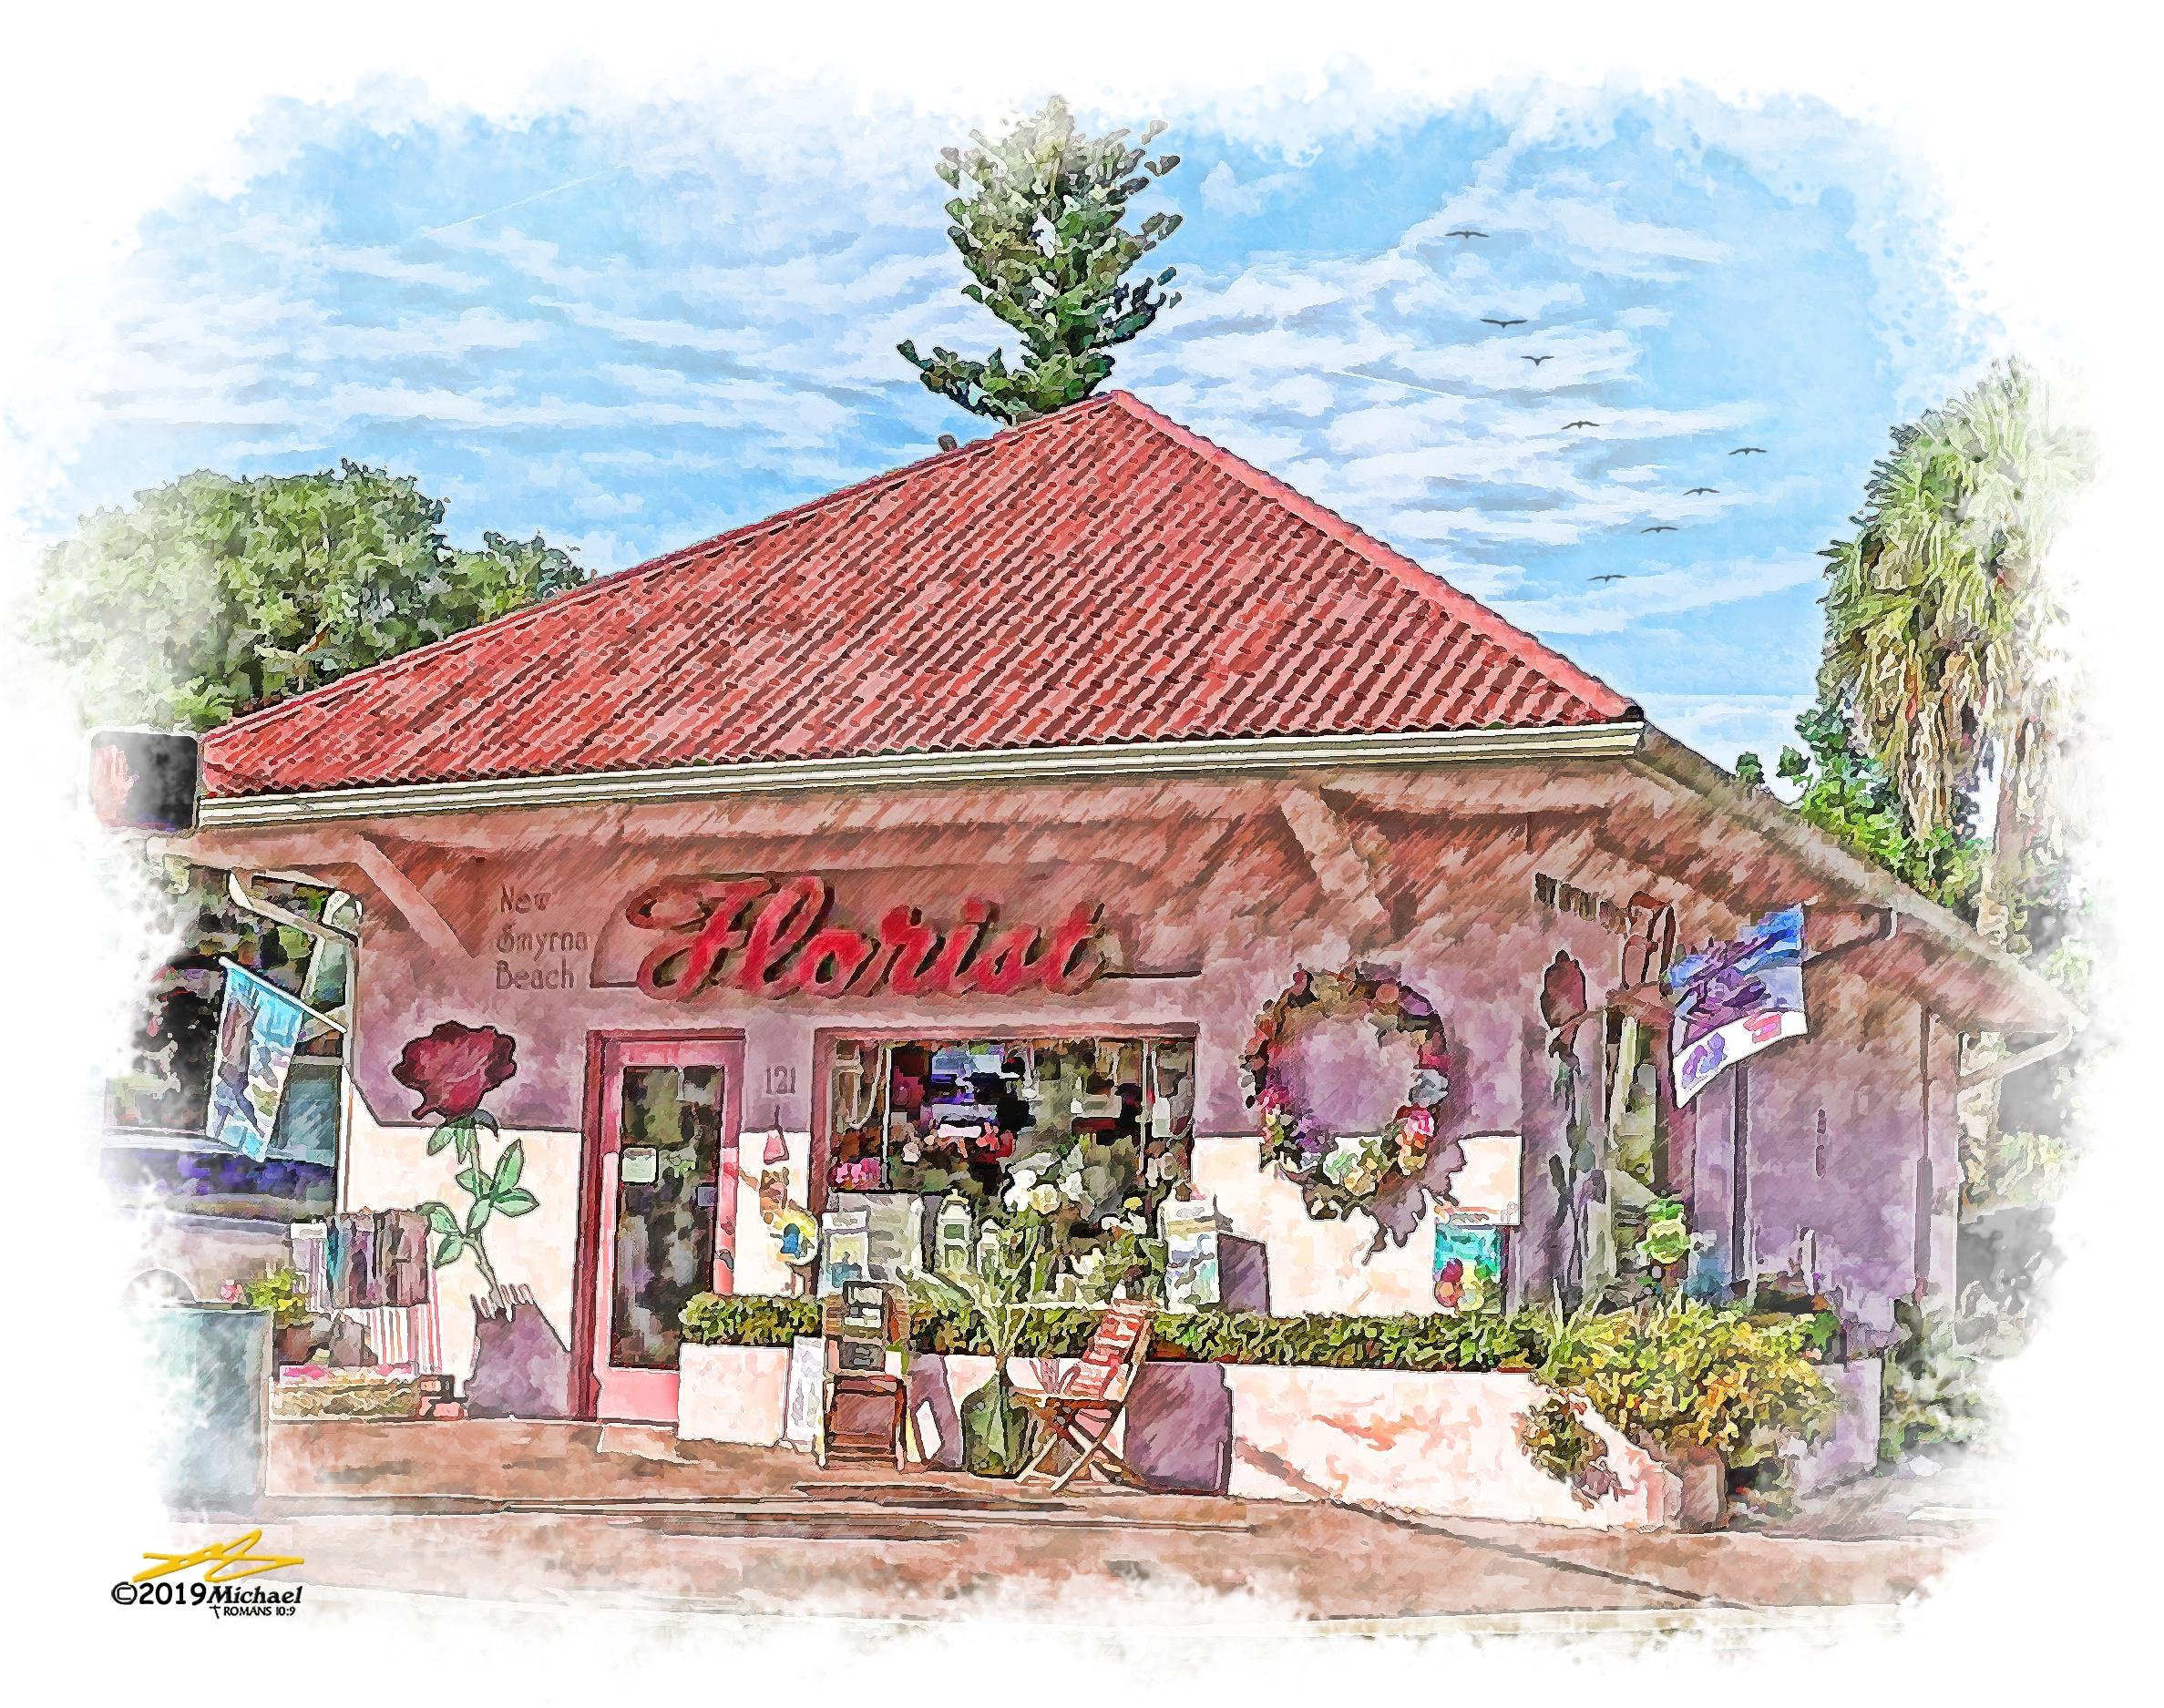 About New Smyrna Beach Florist - New Smyrna Beach, FL Florist